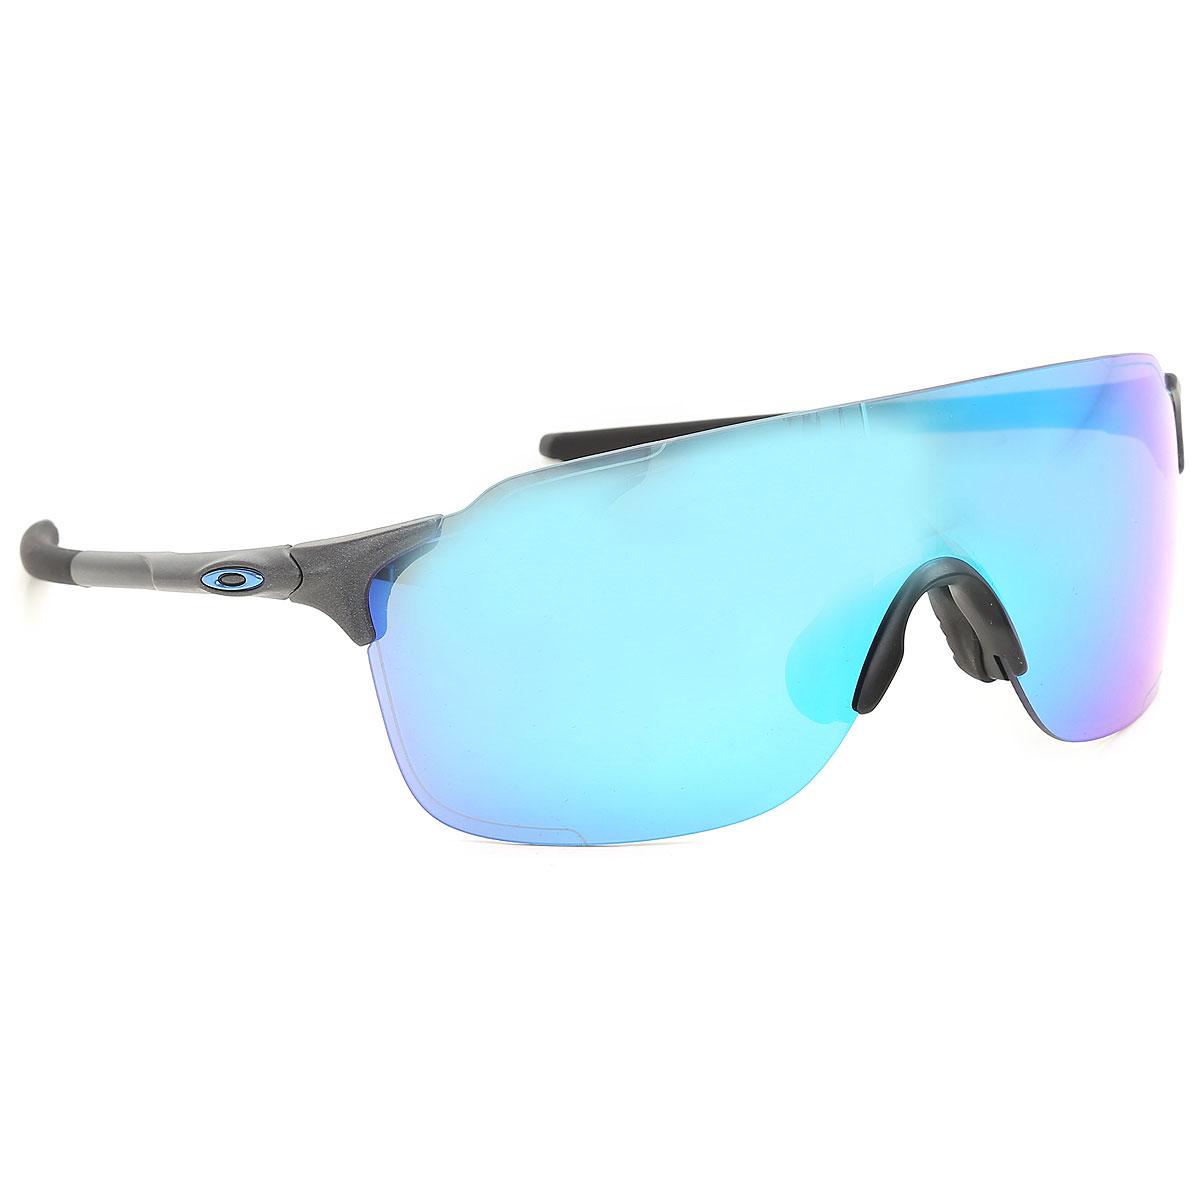 Oakley Sunglasses On Sale, Matt Grey, 2019